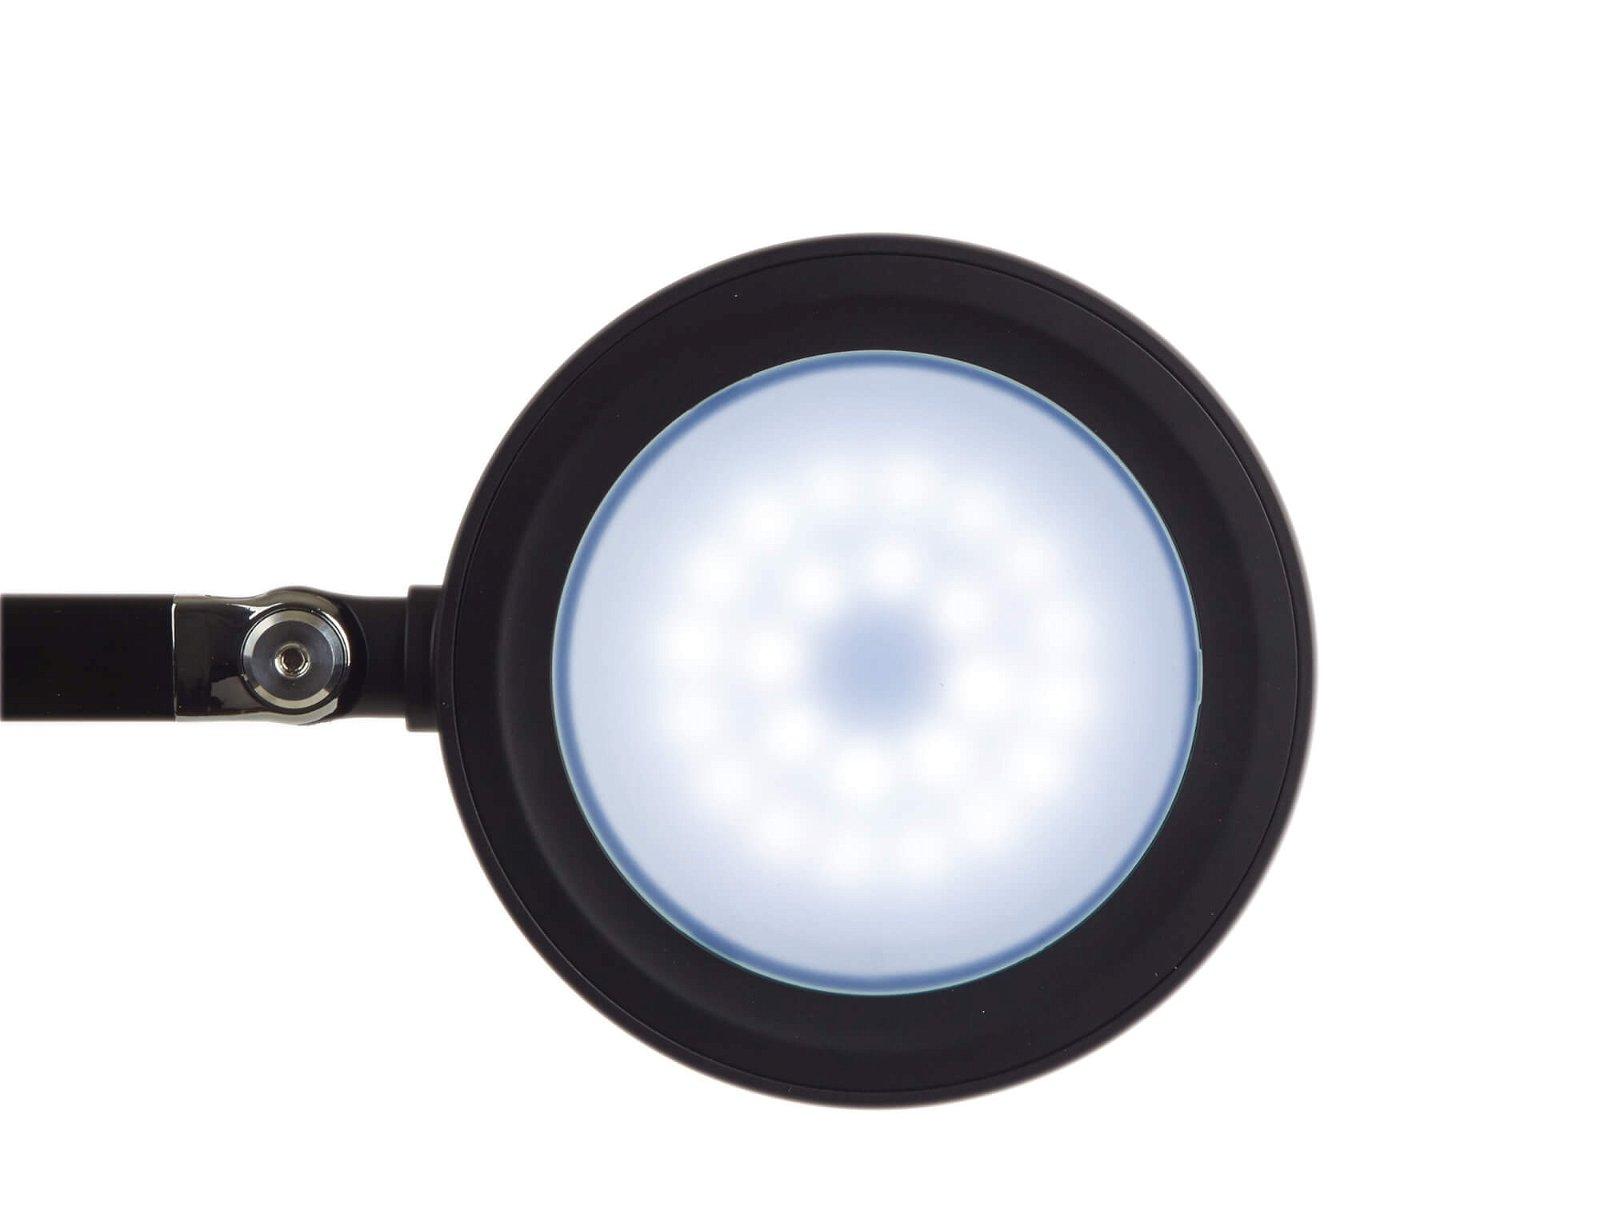 LED-Tischleuchte MAULgrace colour vario, dimmbar